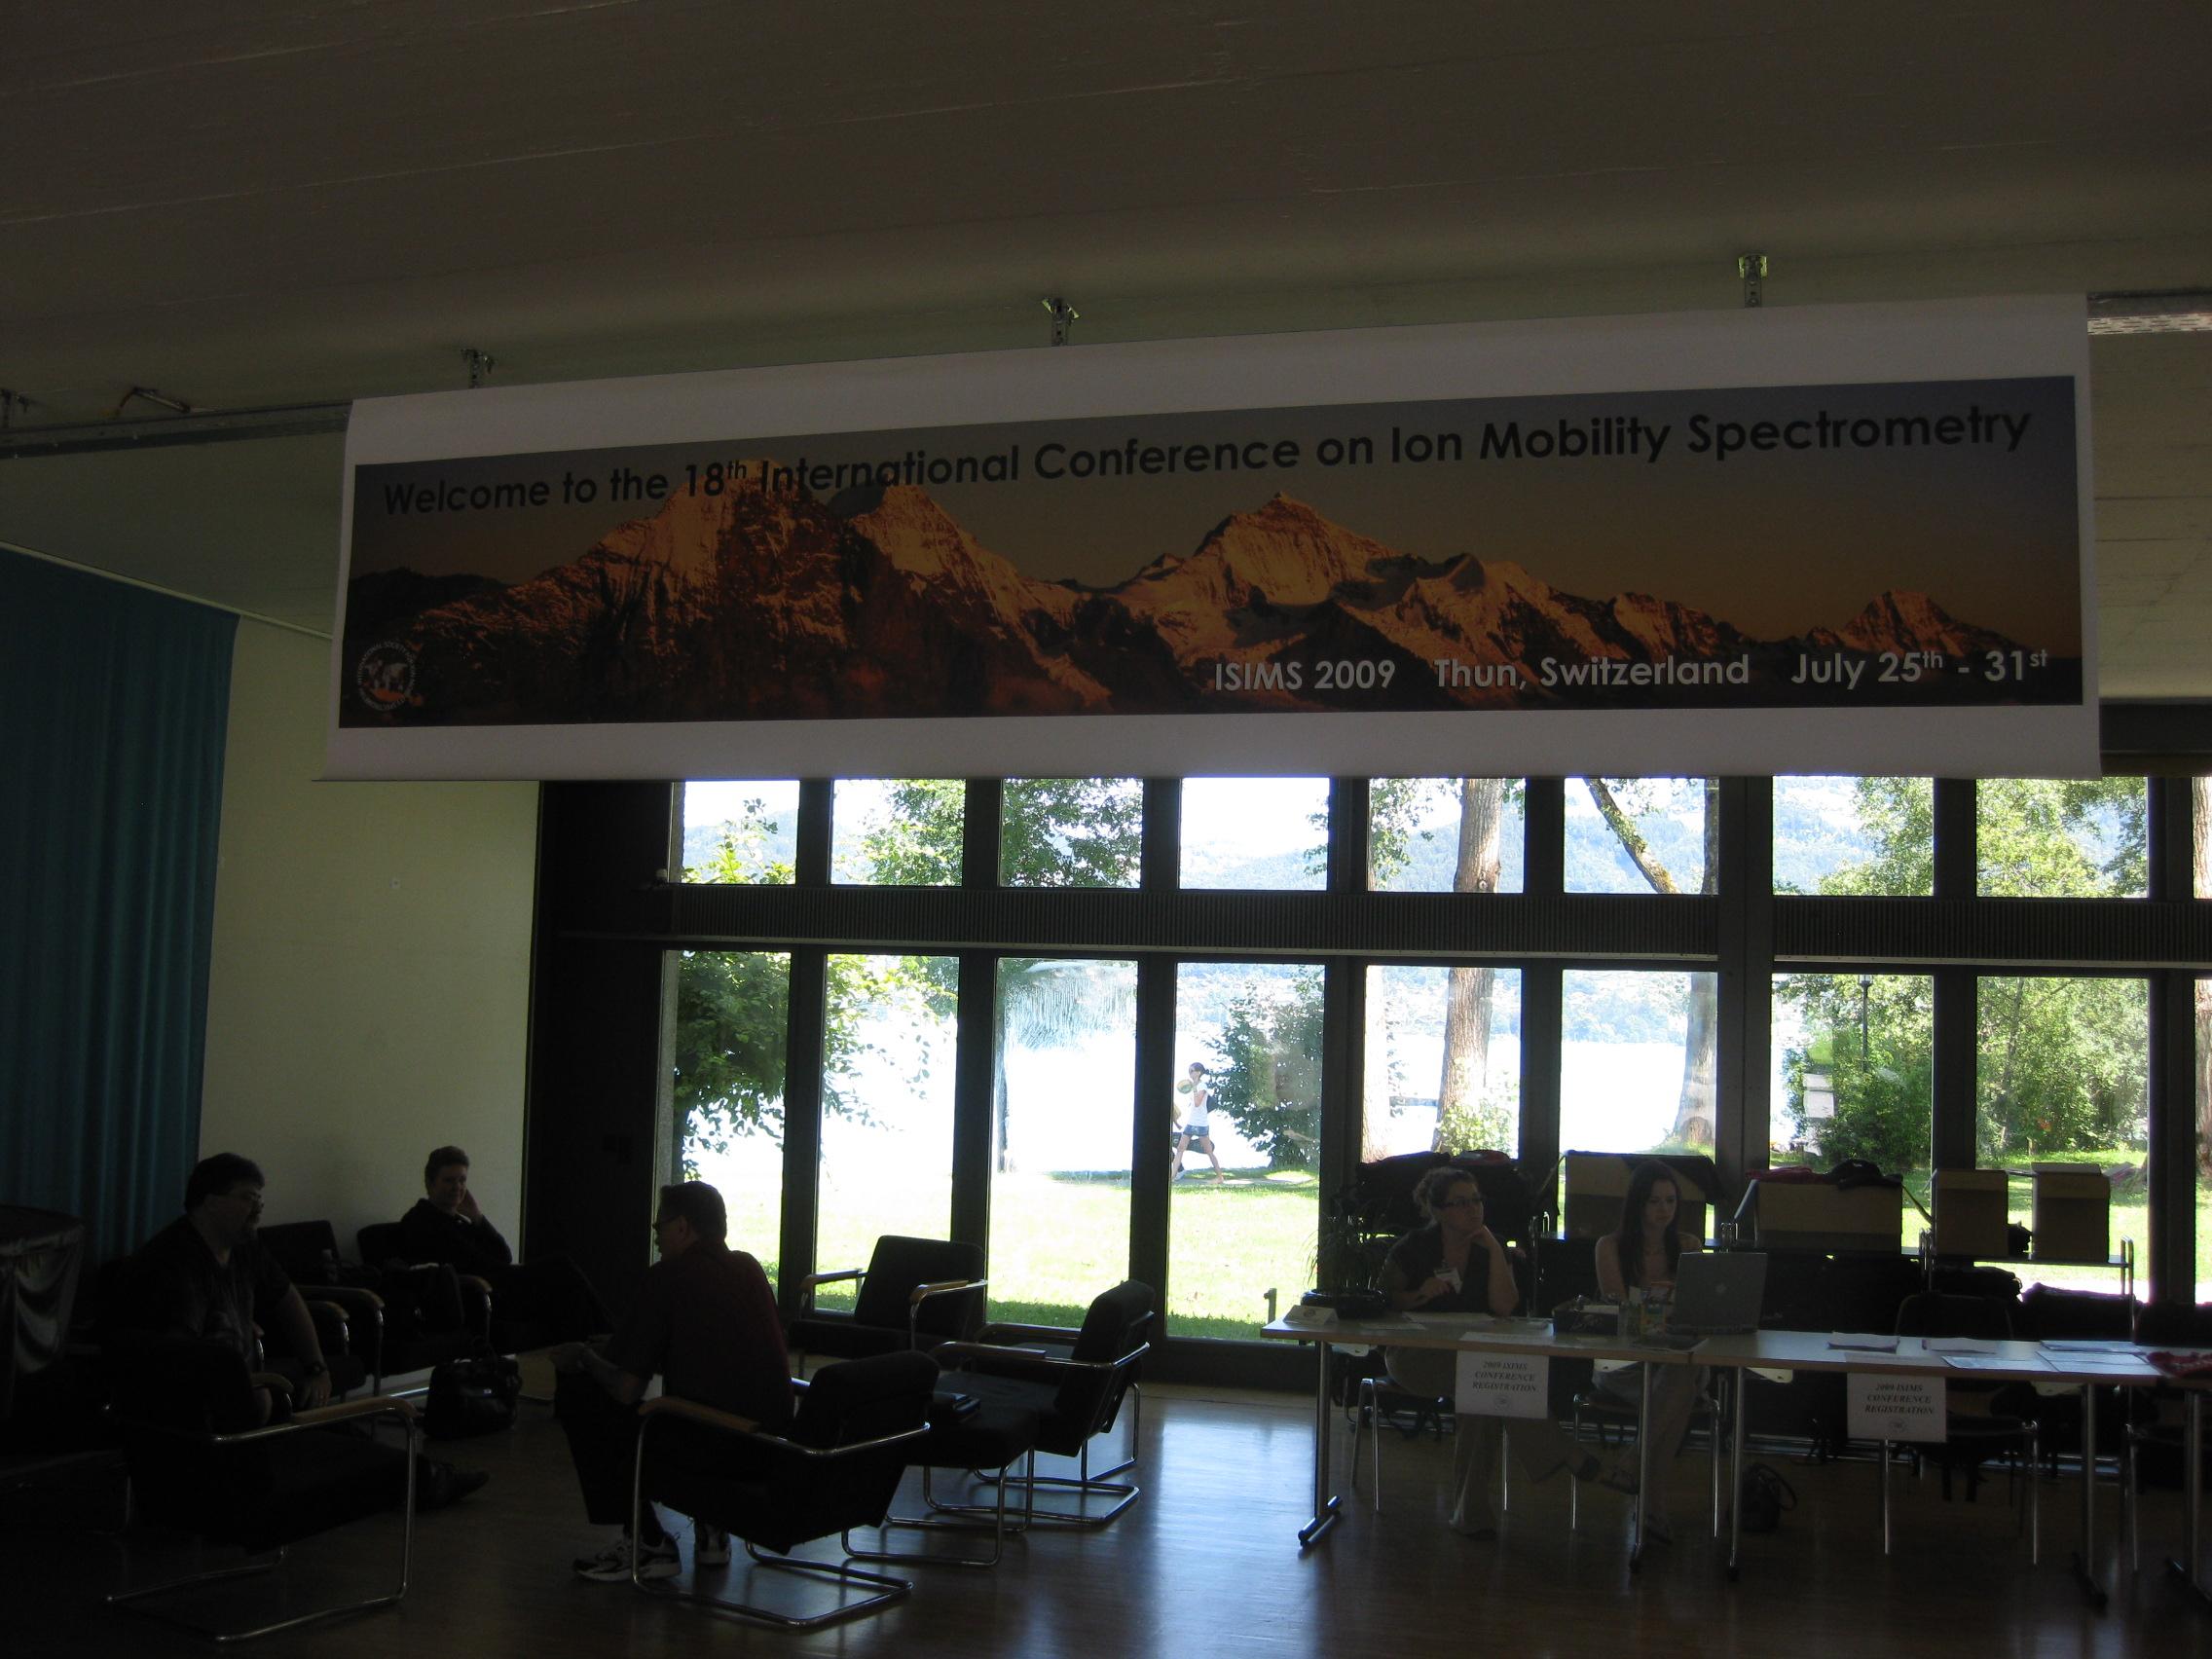 Gwatt-Zentrum Conference Center